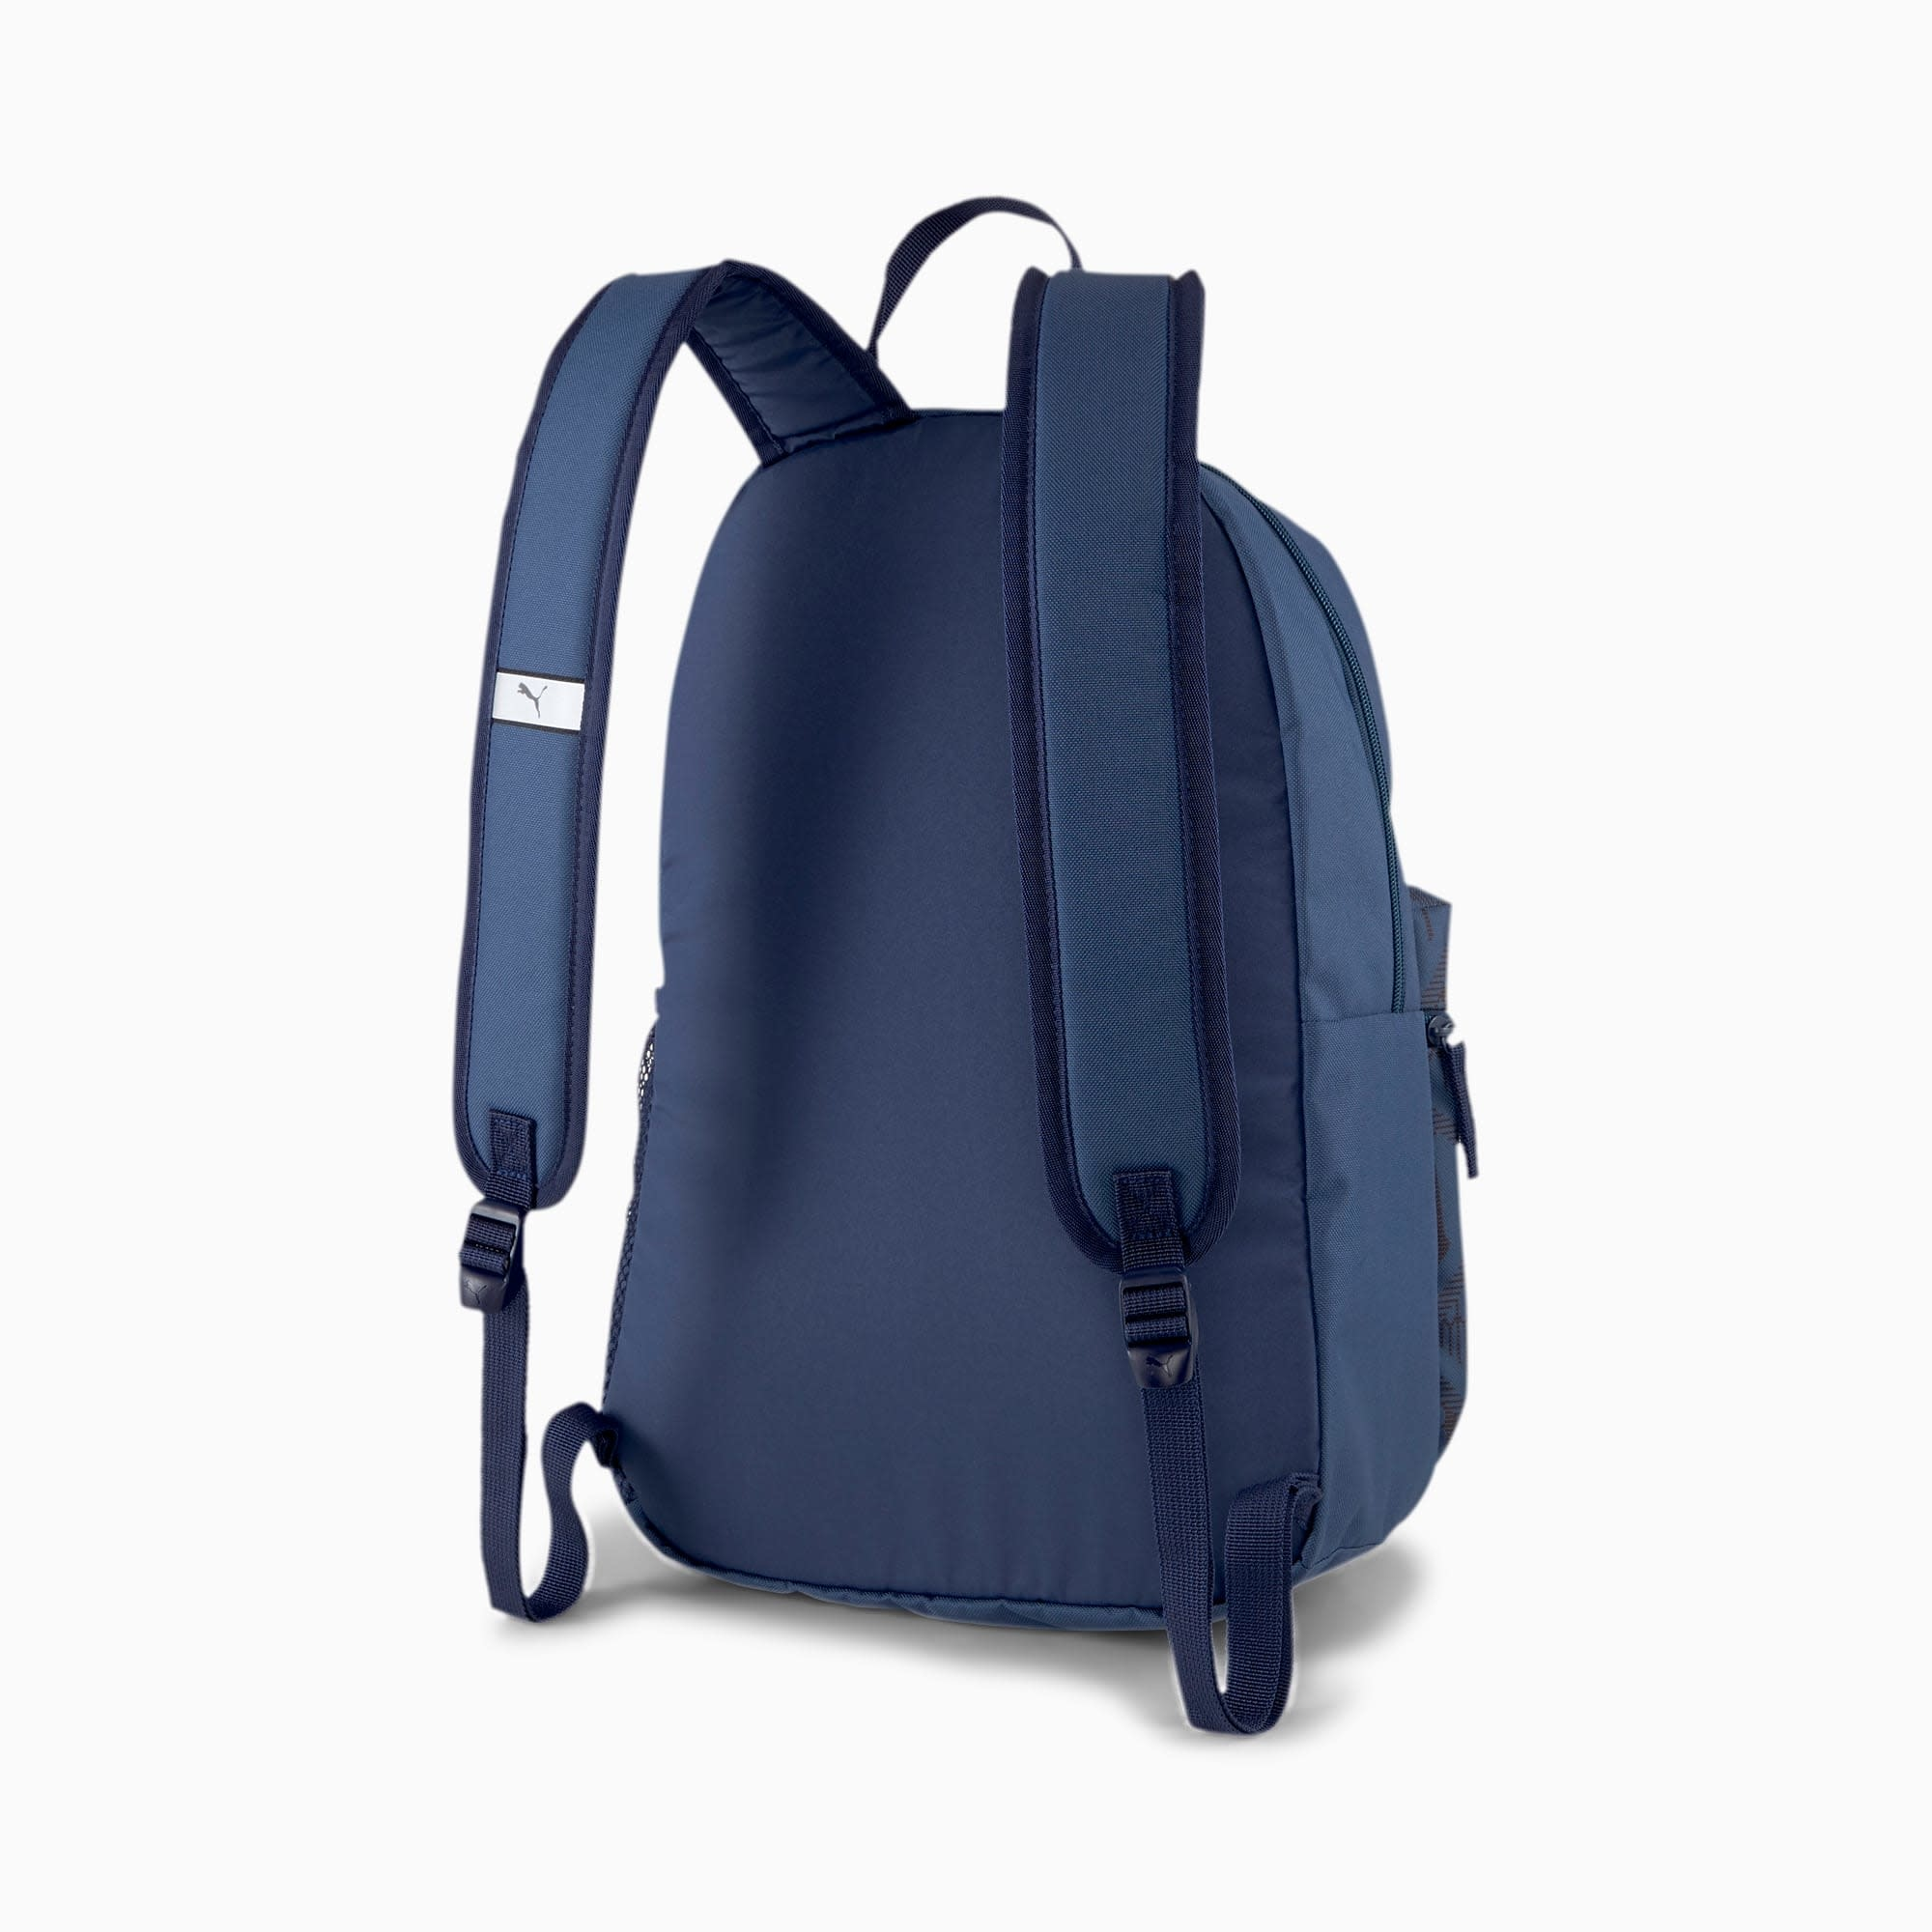 Puma PUMA Manchester City Backpack